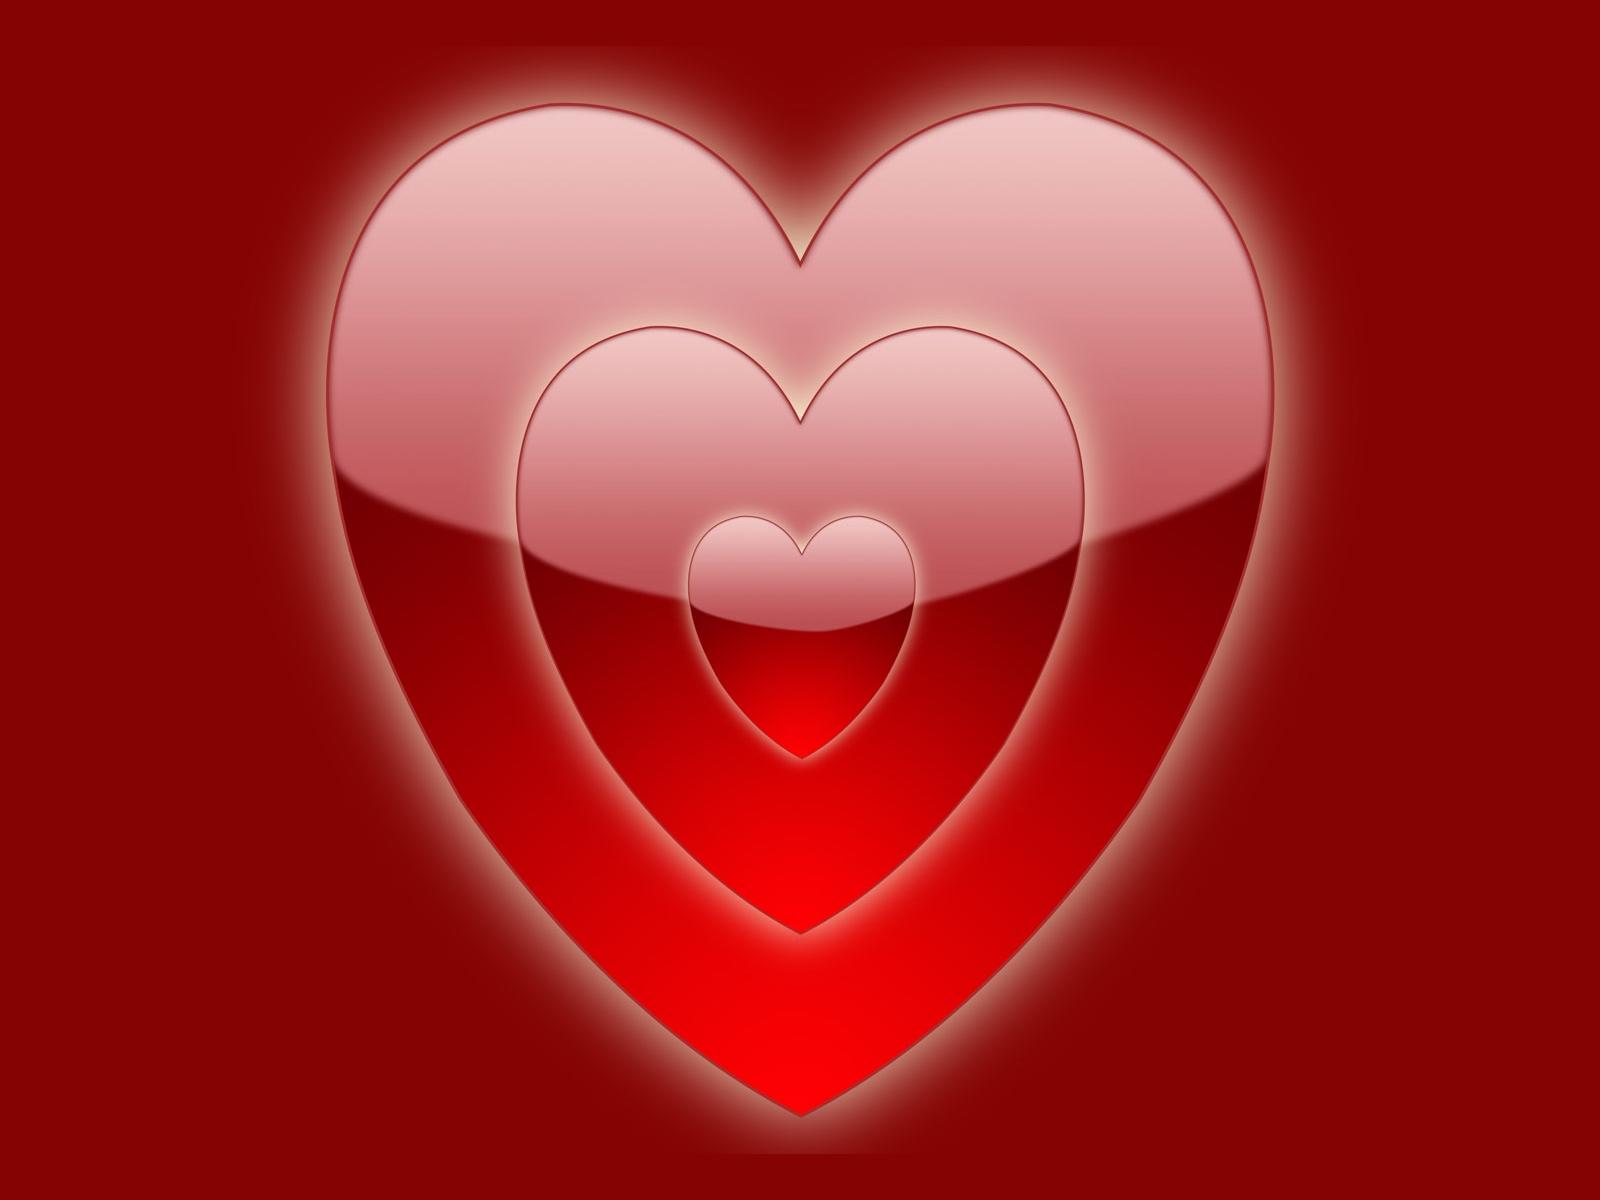 Free Valentines Wallpaper Download 1600x1200px